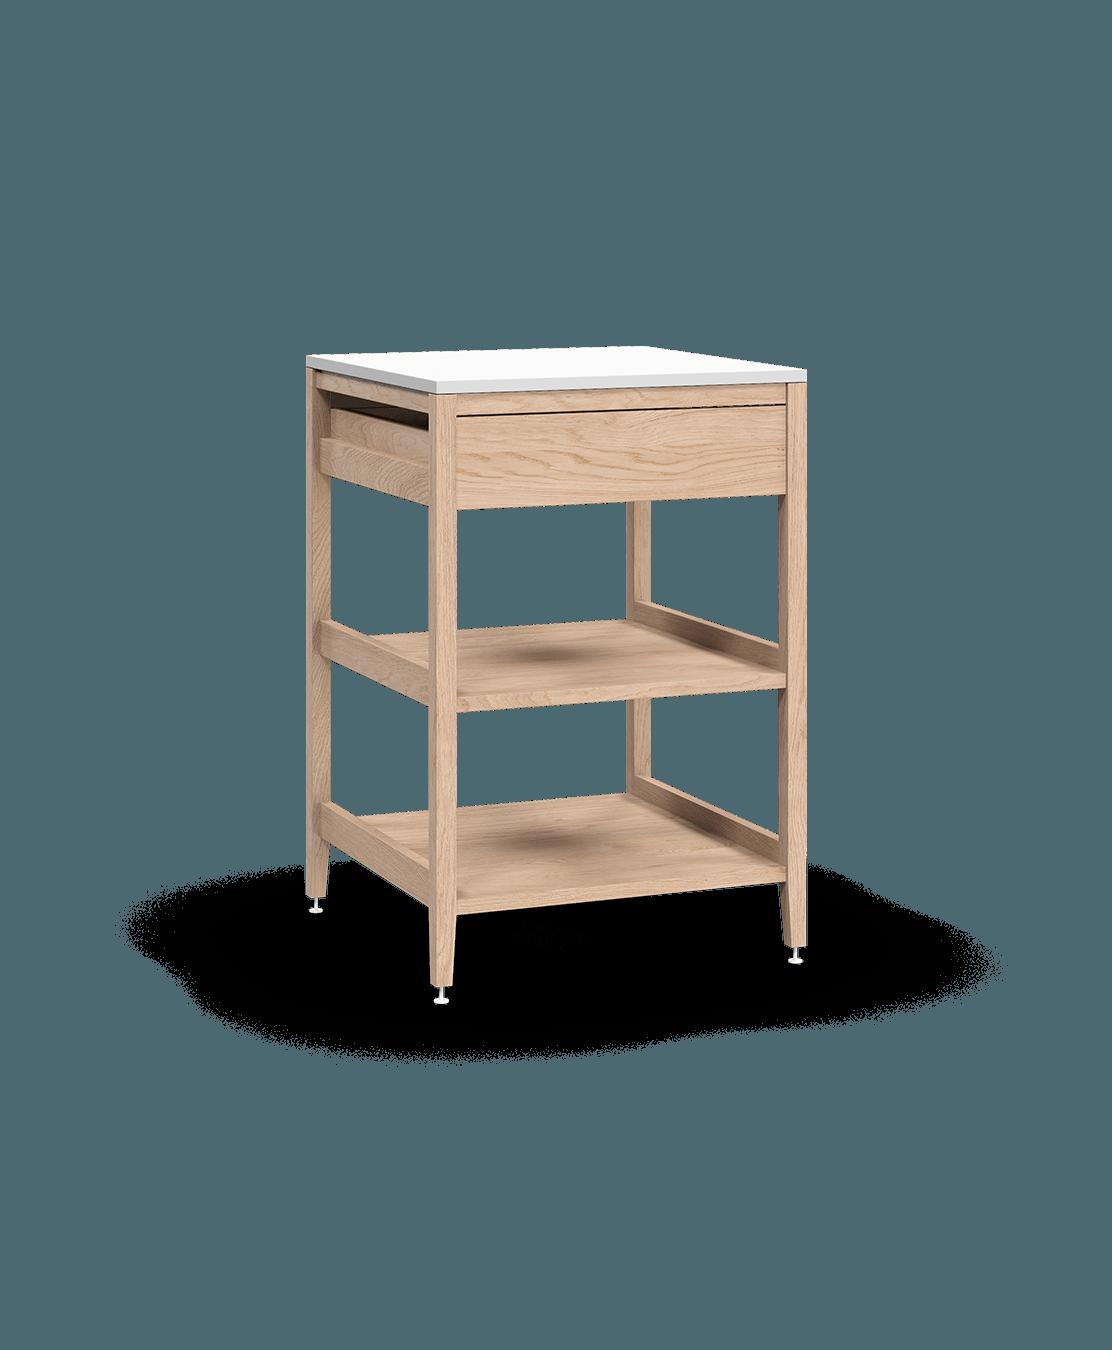 coquo radix white oak solid wood modular 2 wood shelves 1 drawer base kitchen cabinet 24 inch C1-C-24SBW-102W3-NA